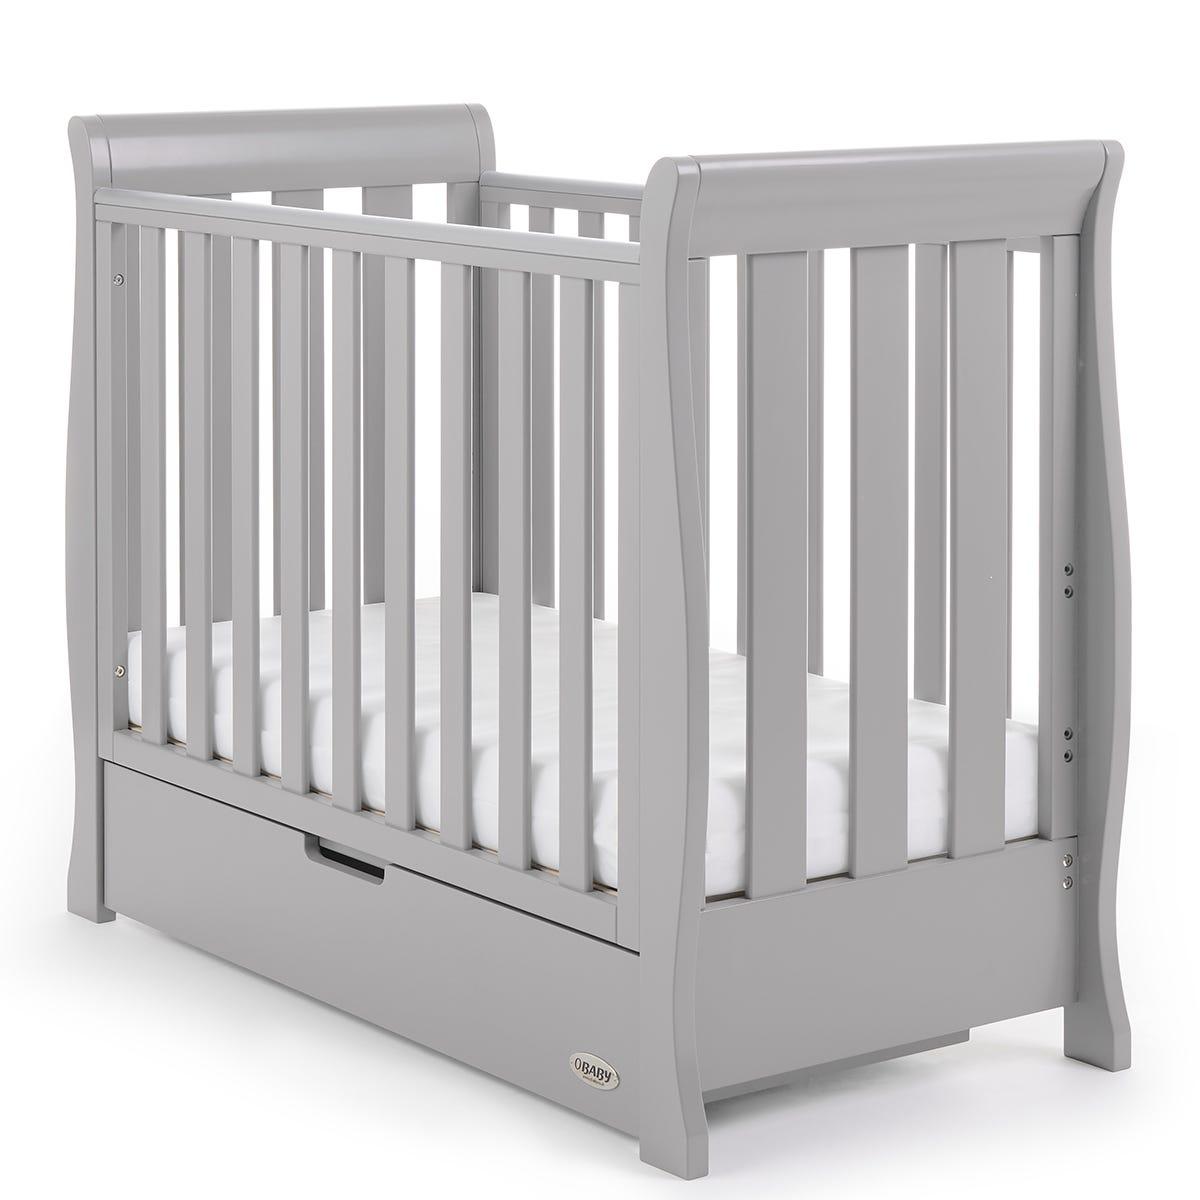 Obaby Stamford Space Saver Sleigh Cot - Warm Grey